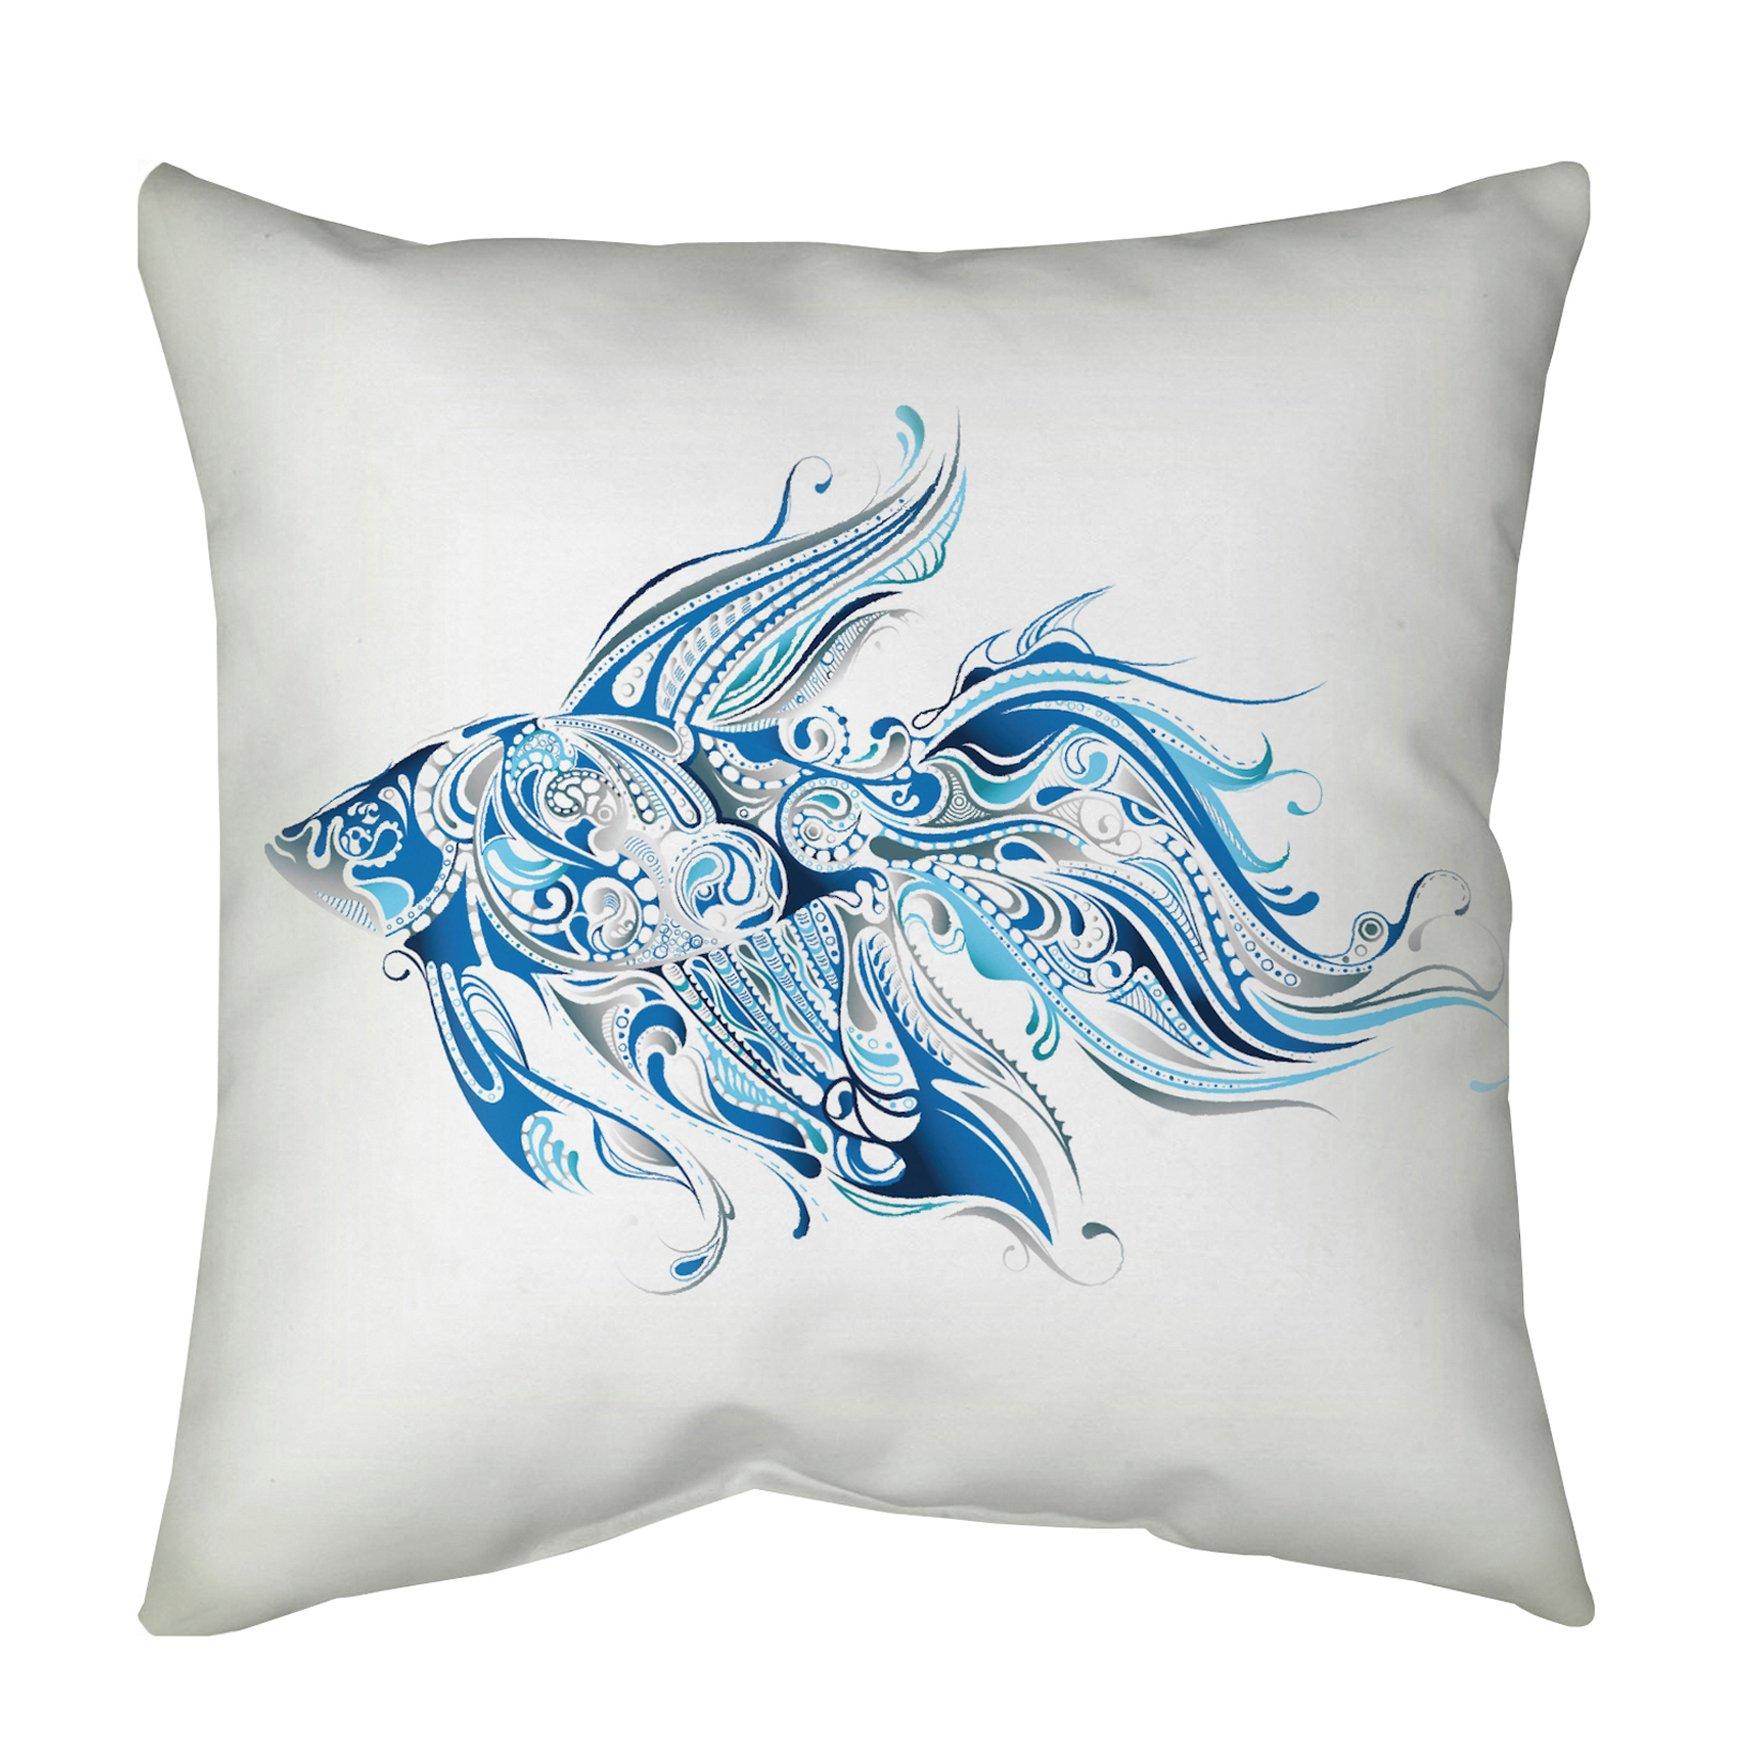 Blue Fish Accent Pillow By Blend Home Twist Modern